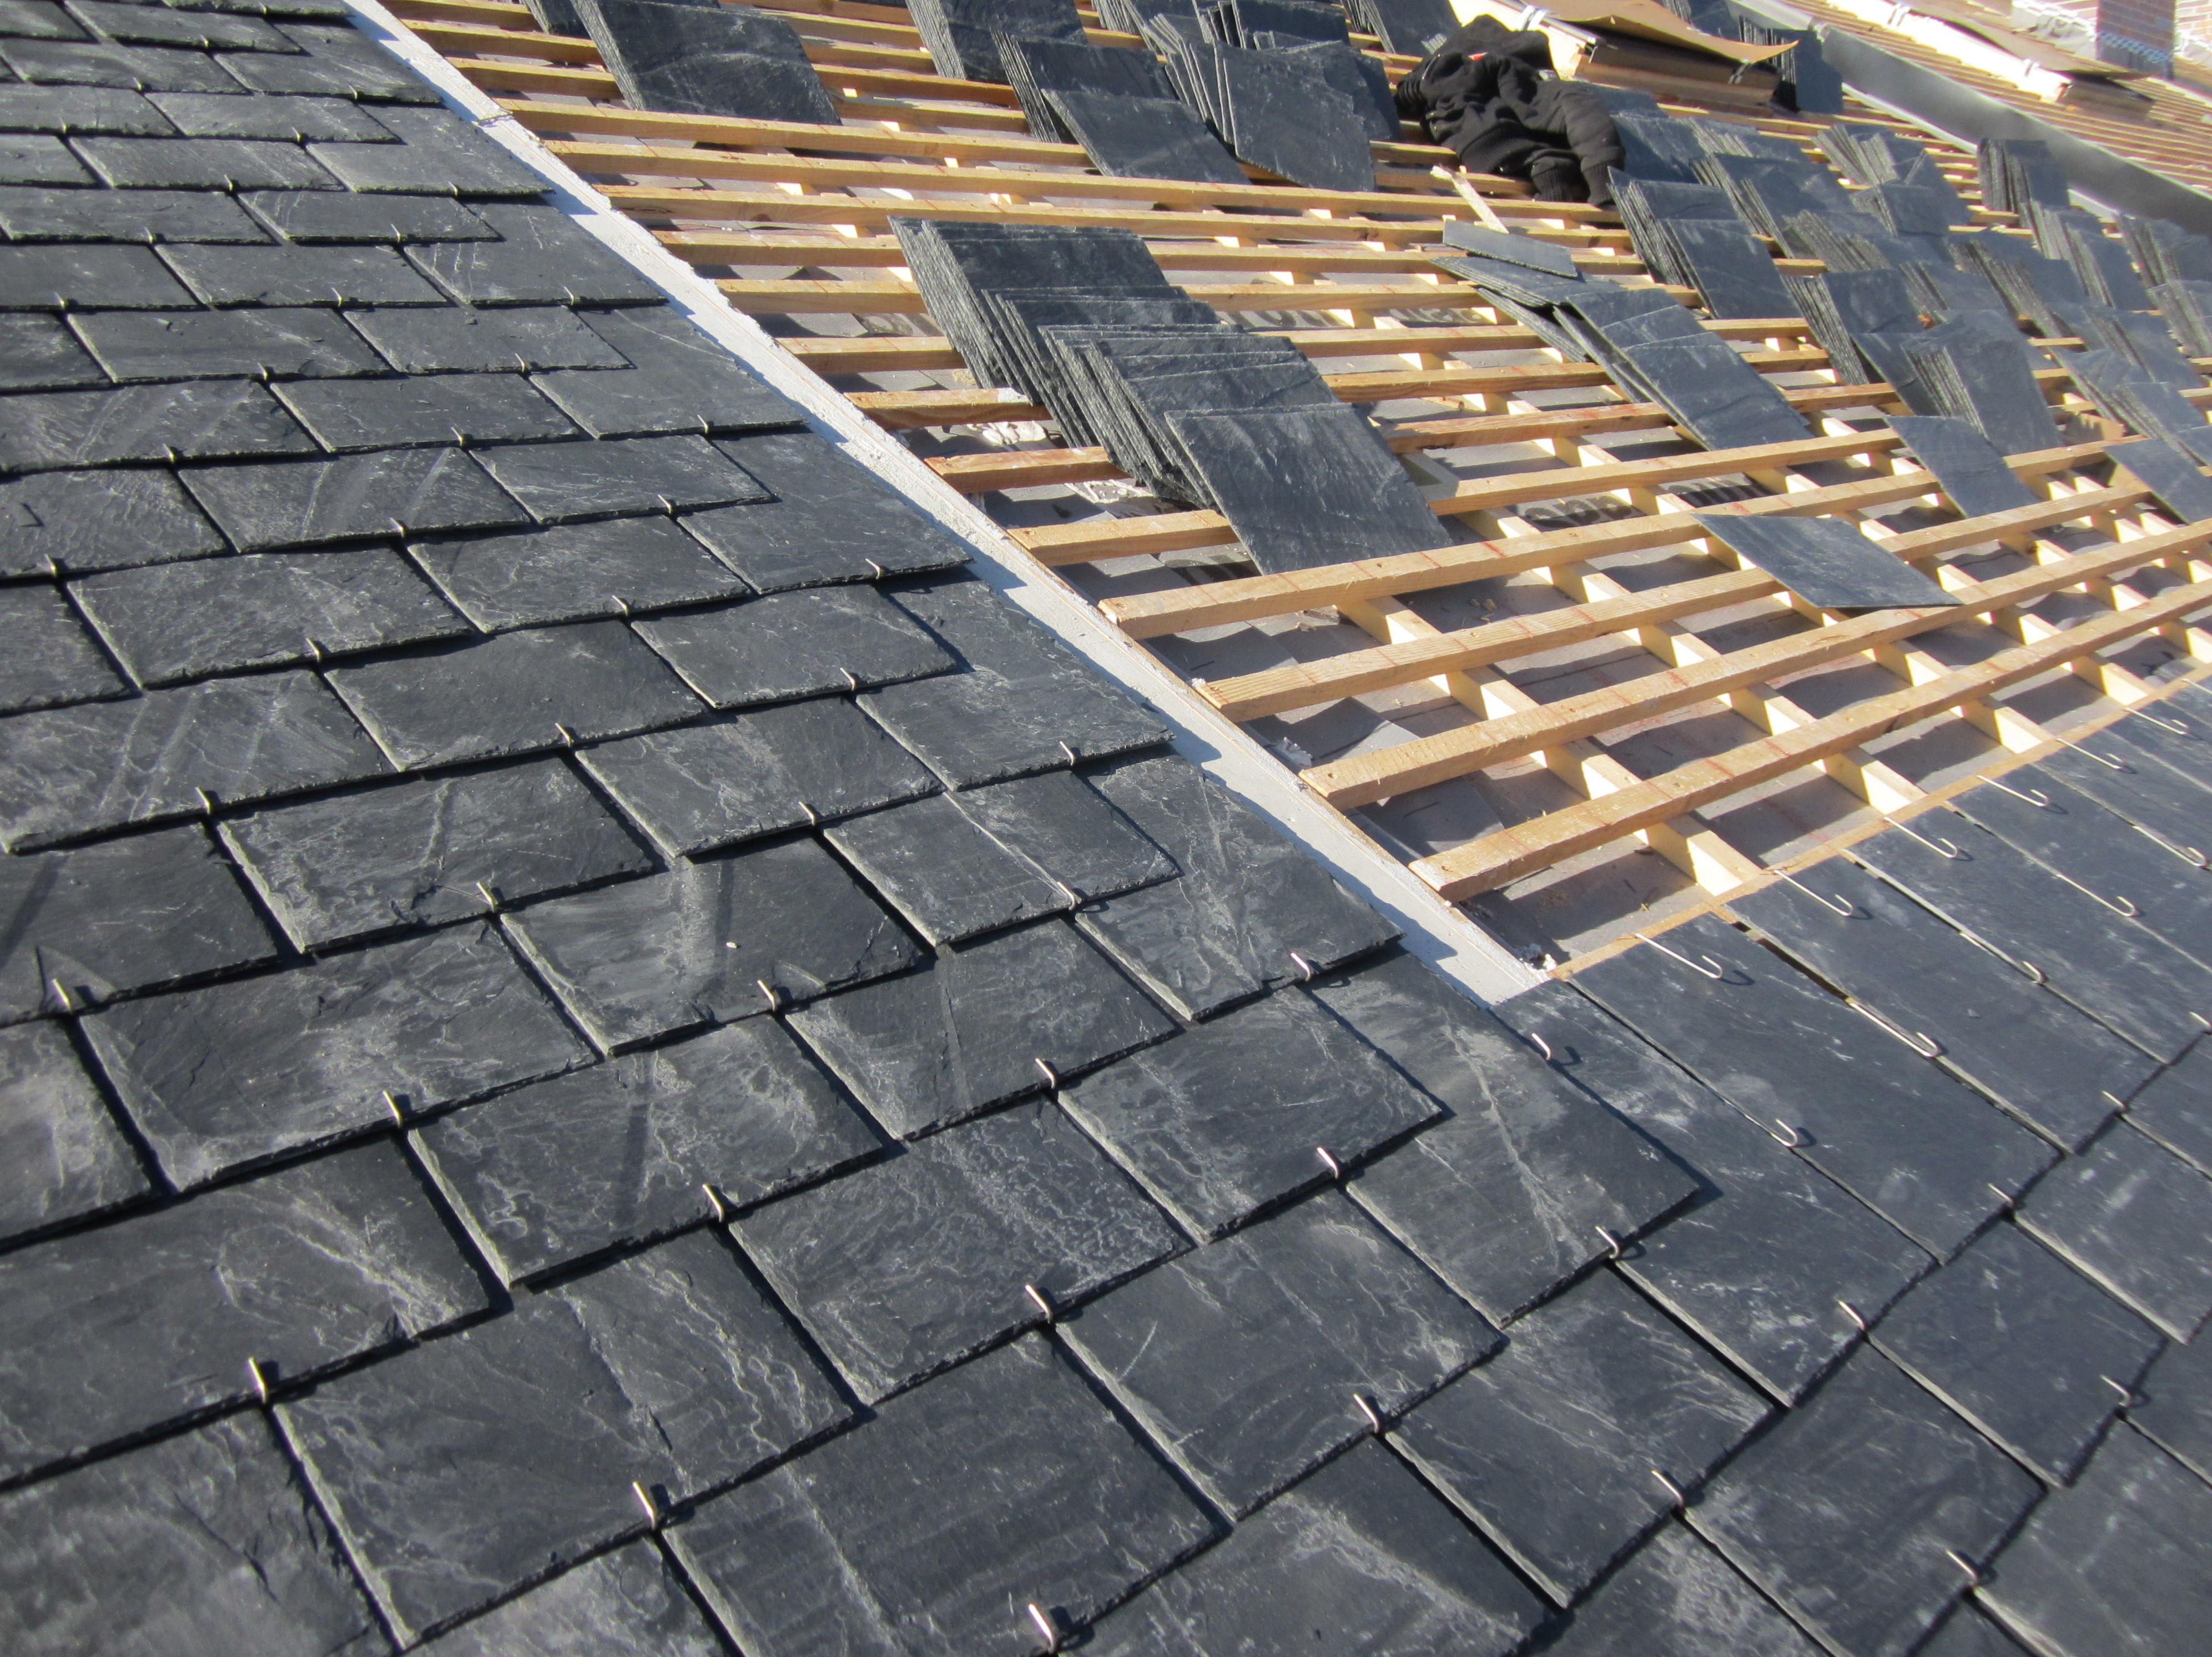 Pizarra construccion materiales de construcci n para la - Materiales de construccion las palmas ...